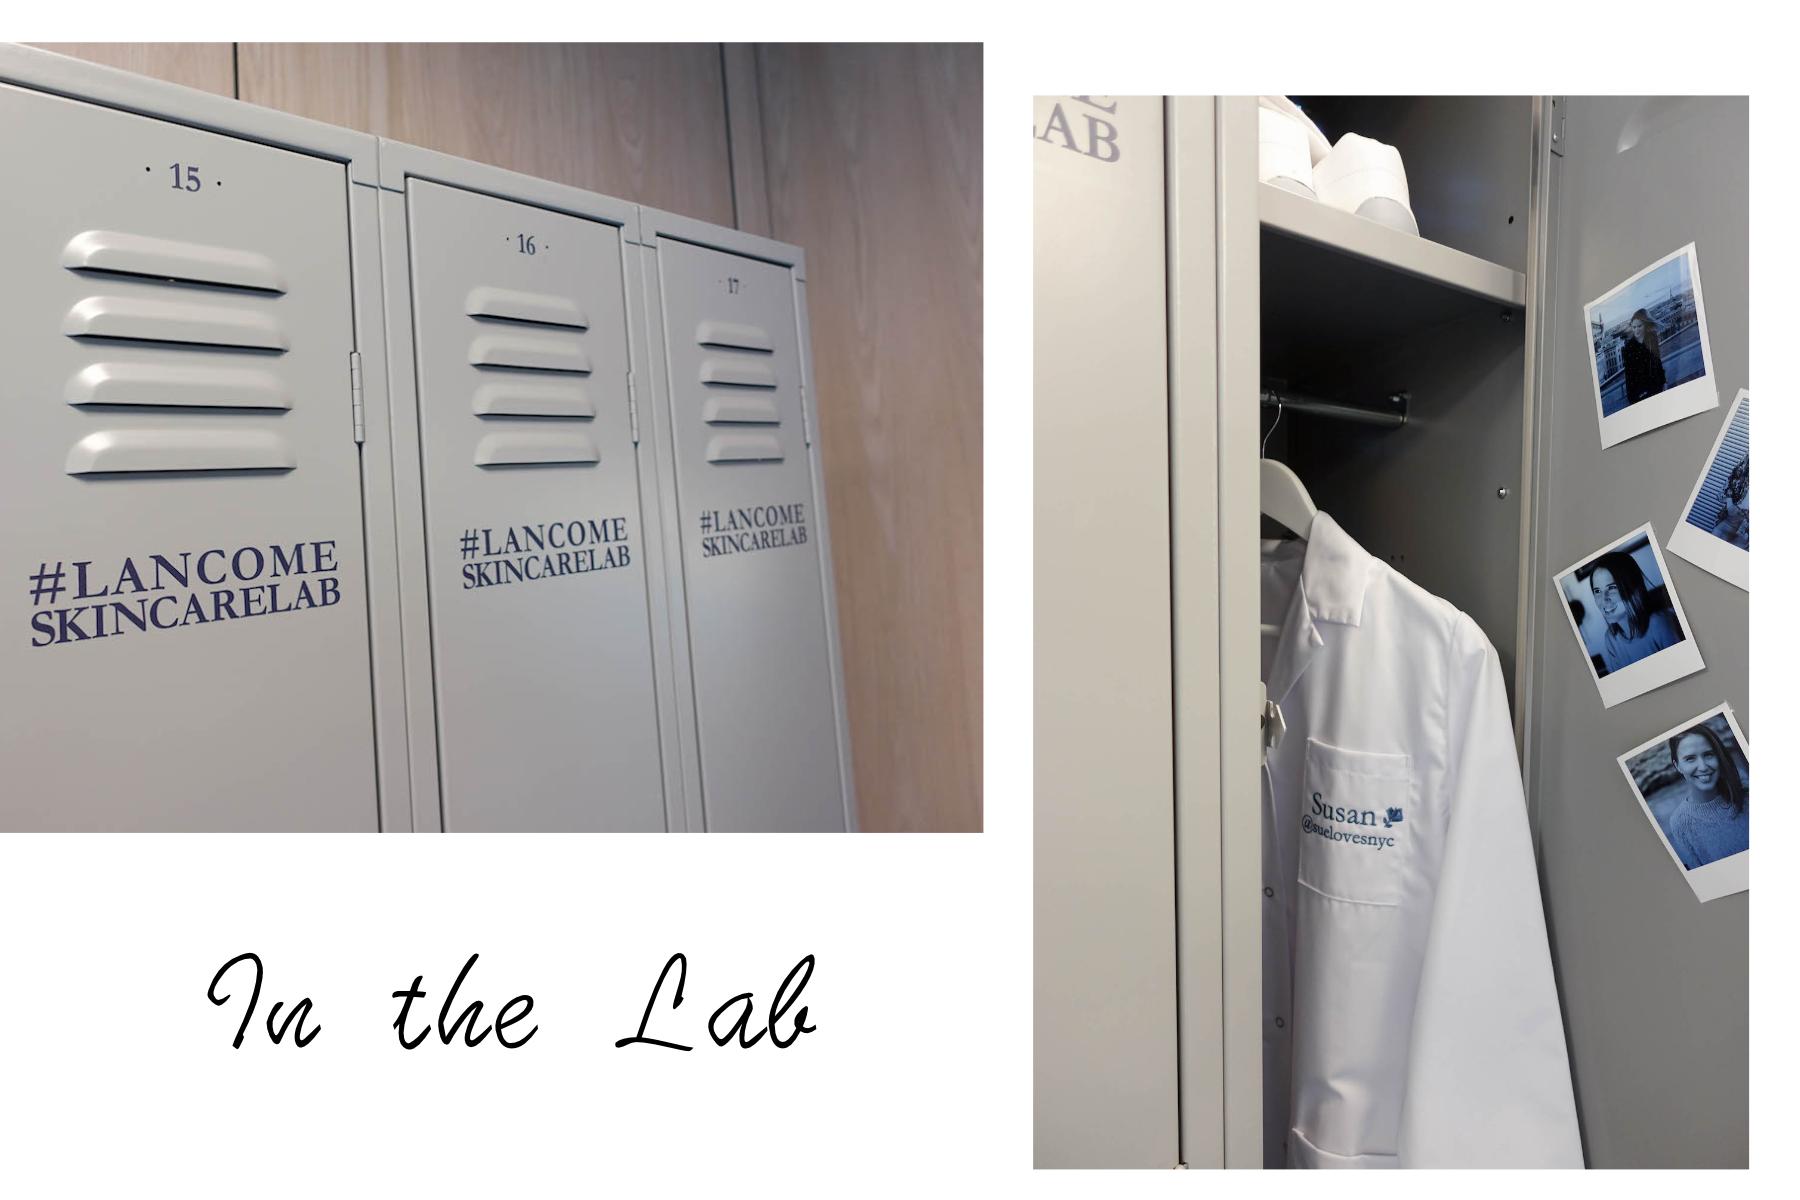 Suelovesnyc_lancome_labor_1 Lancôme skincare lab